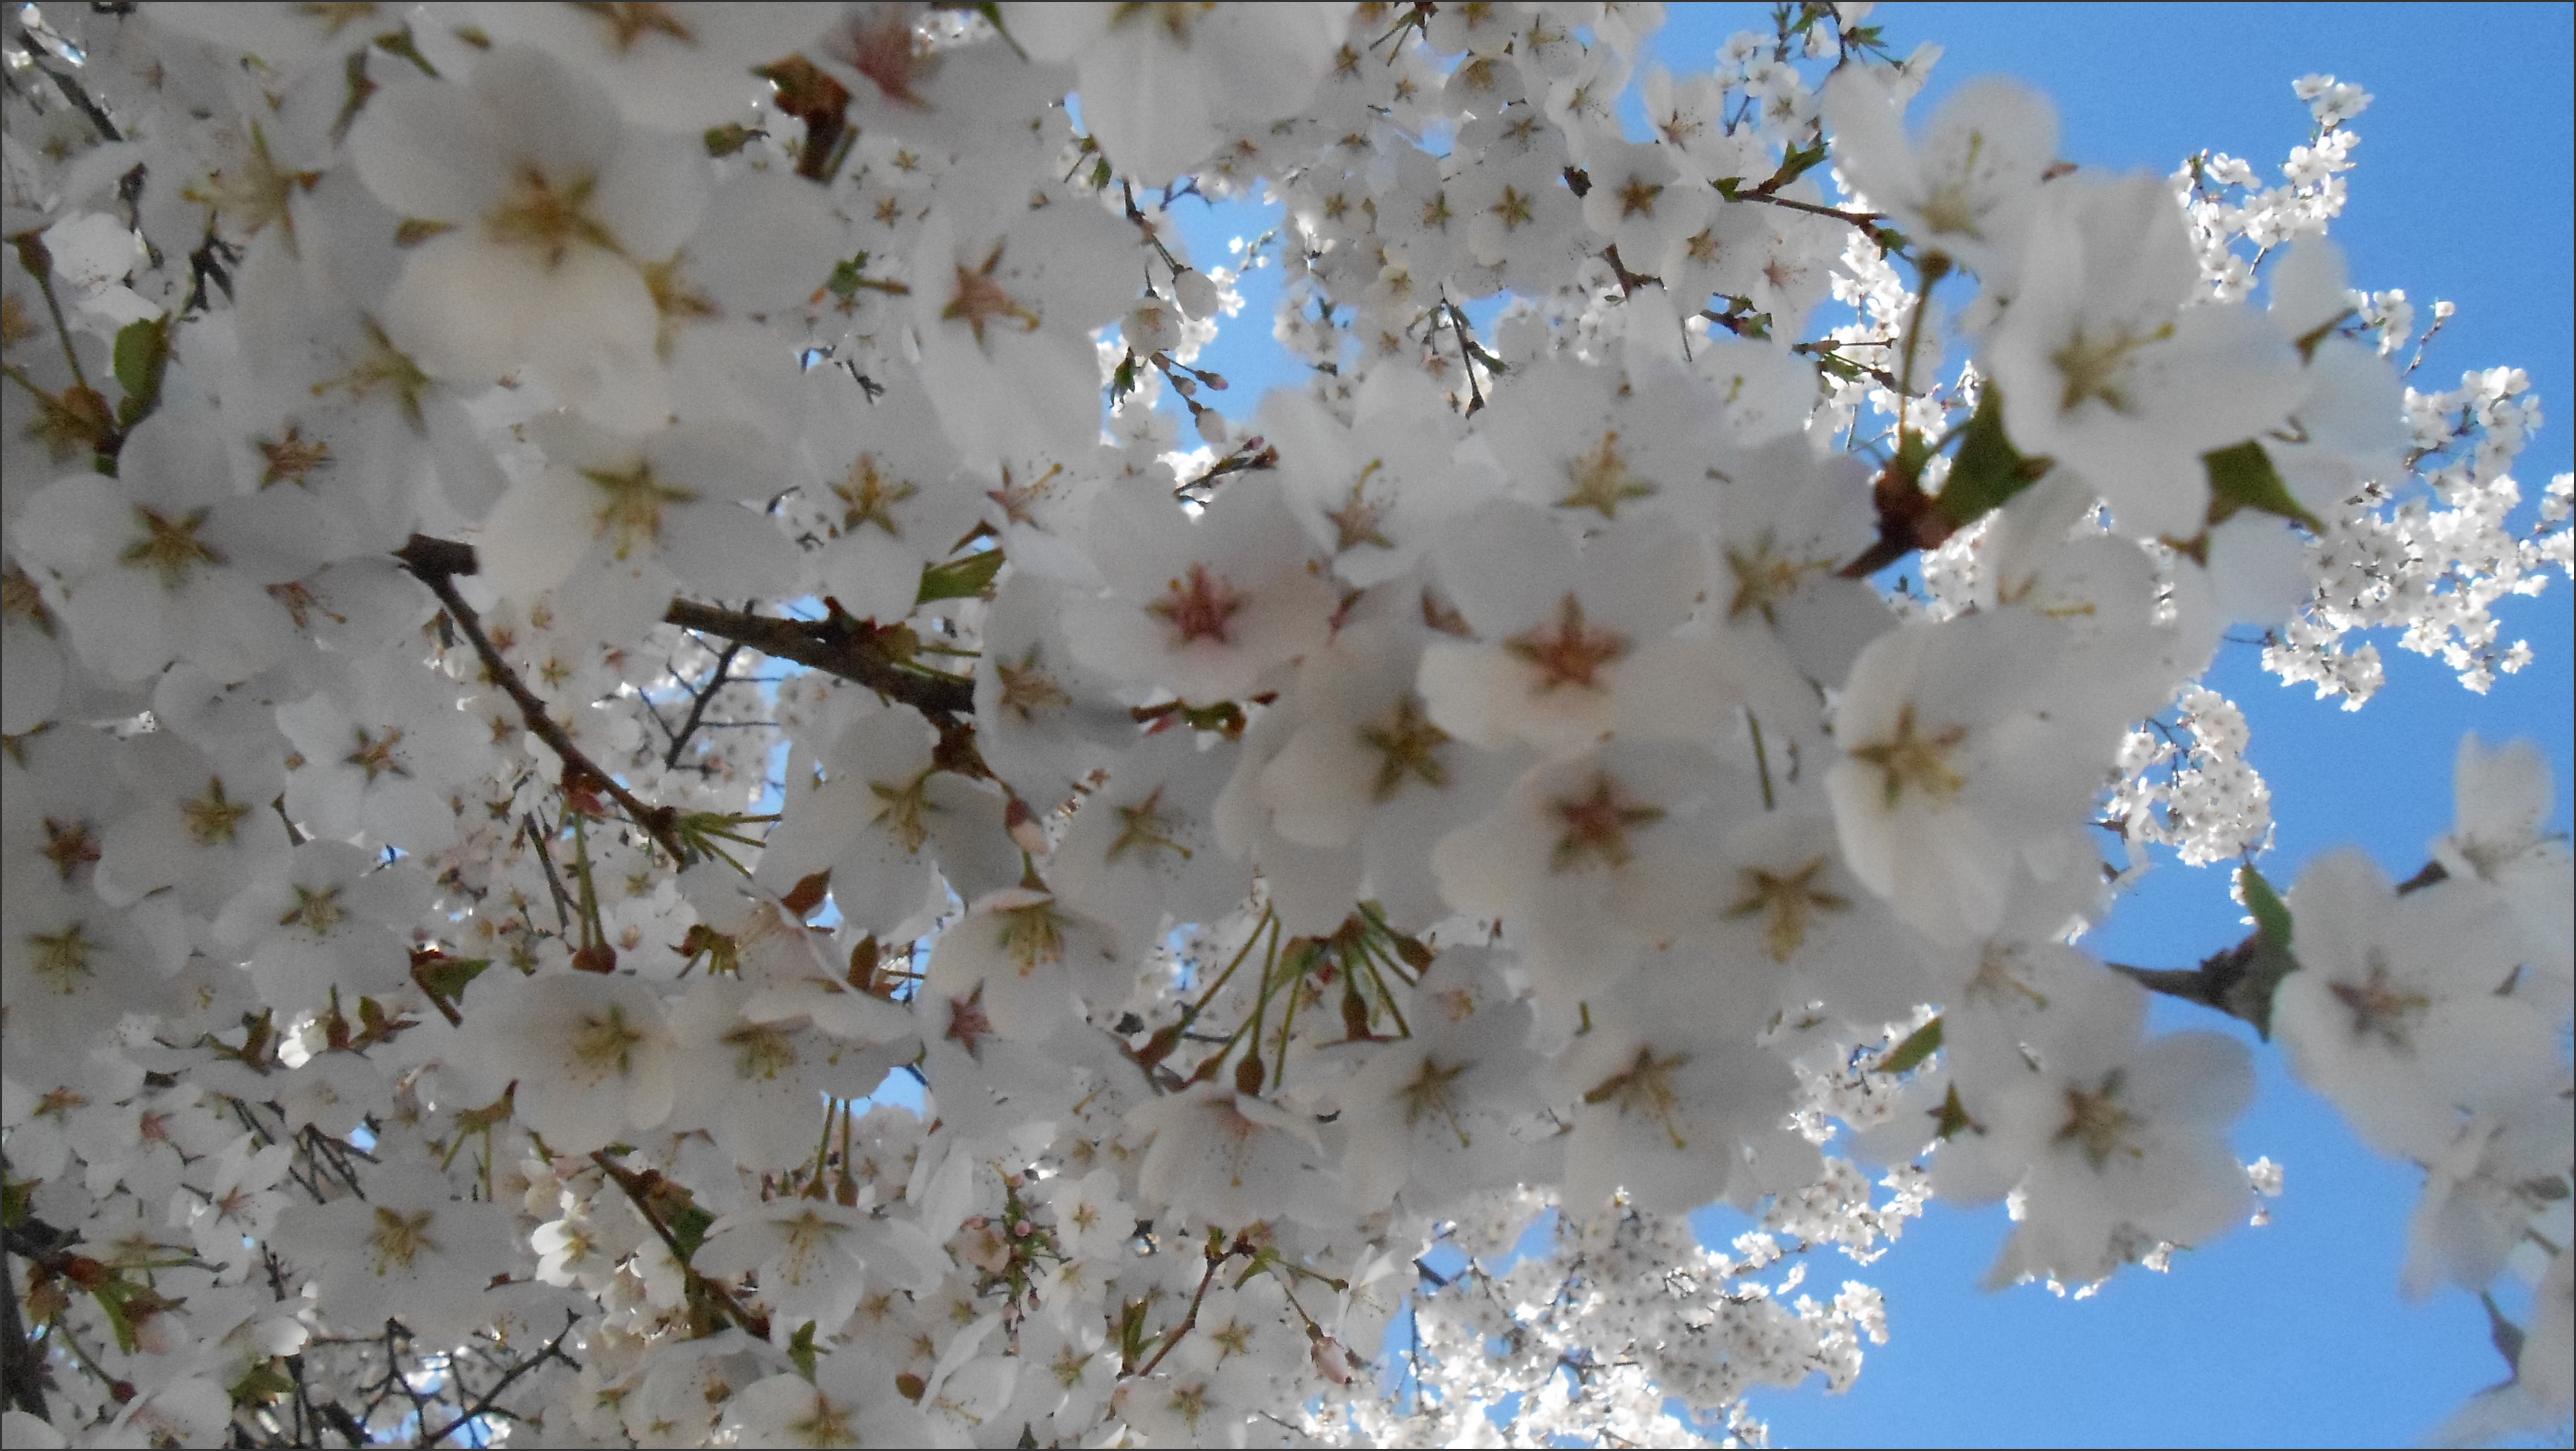 lac fleurs printemps blanches - photo #32